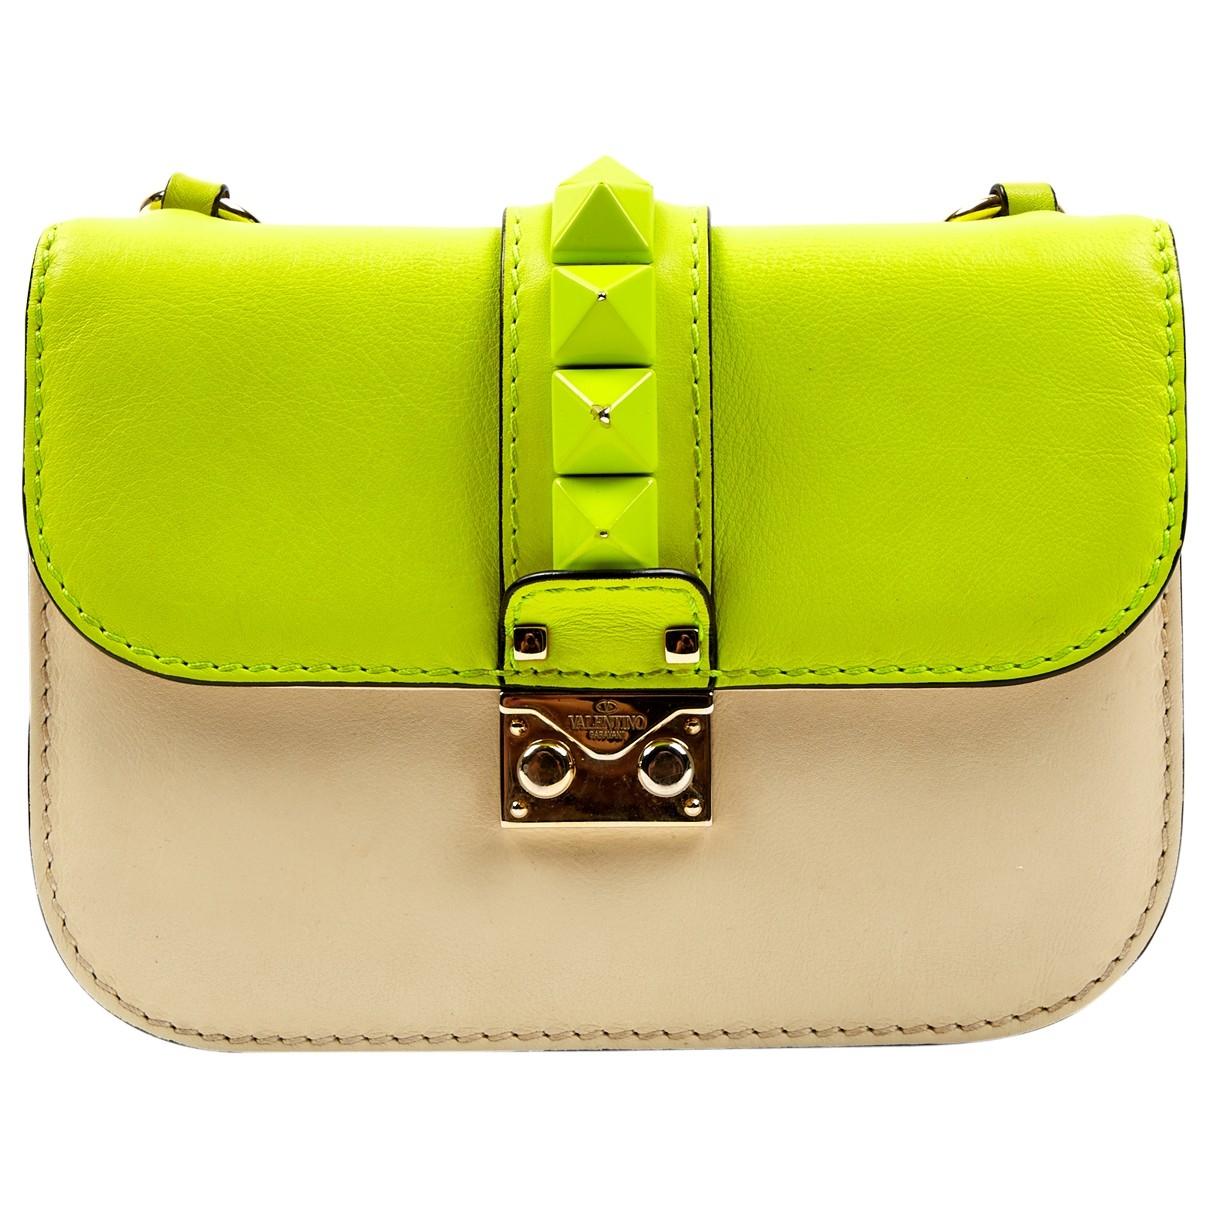 Valentino Garavani Glam Lock Yellow Leather handbag for Women \N